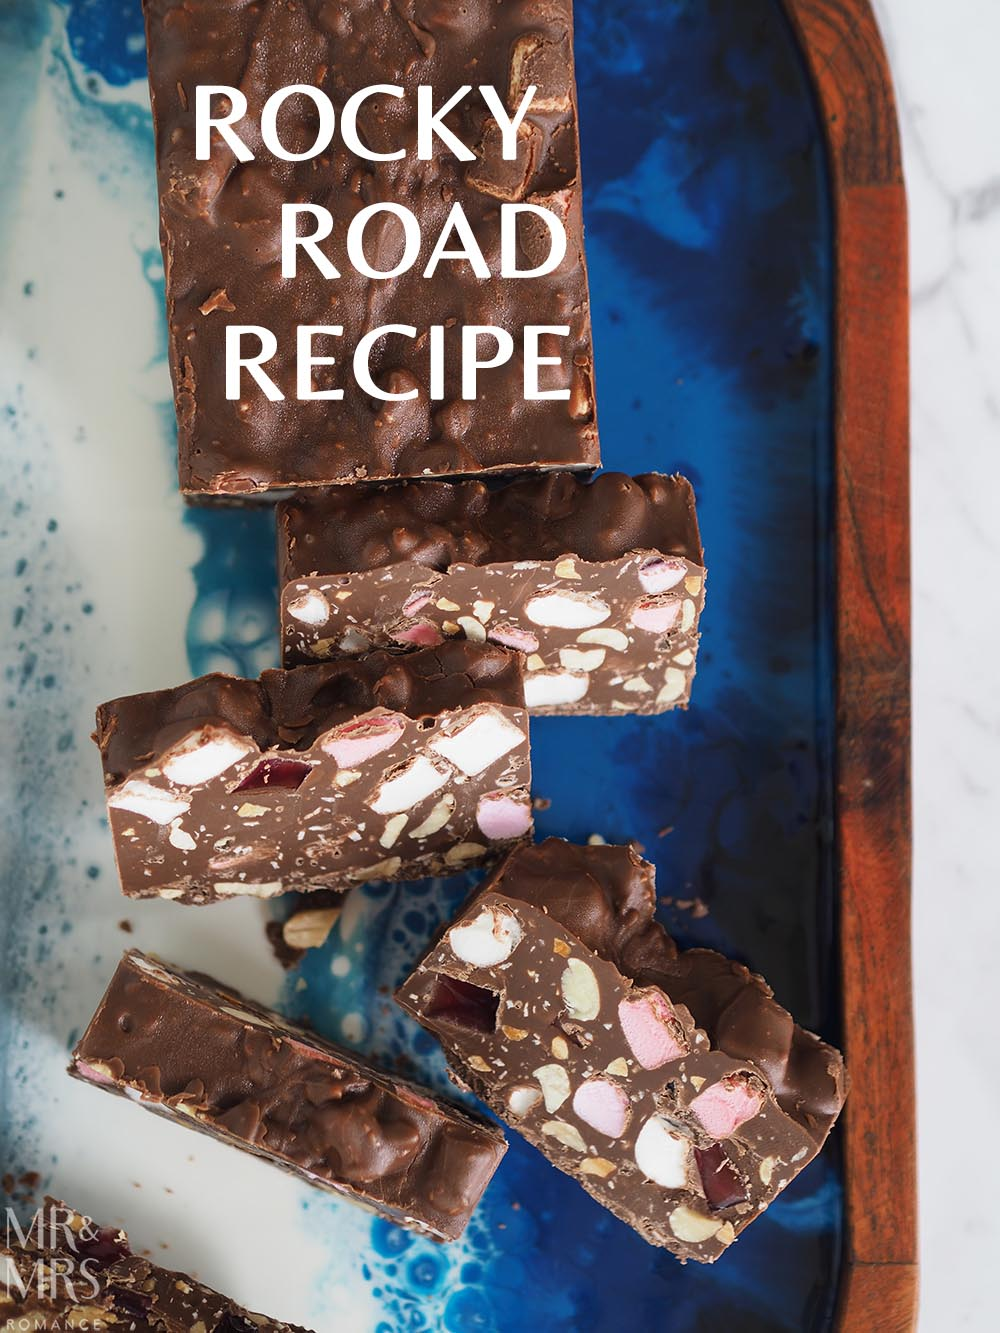 Rocky Road recipe